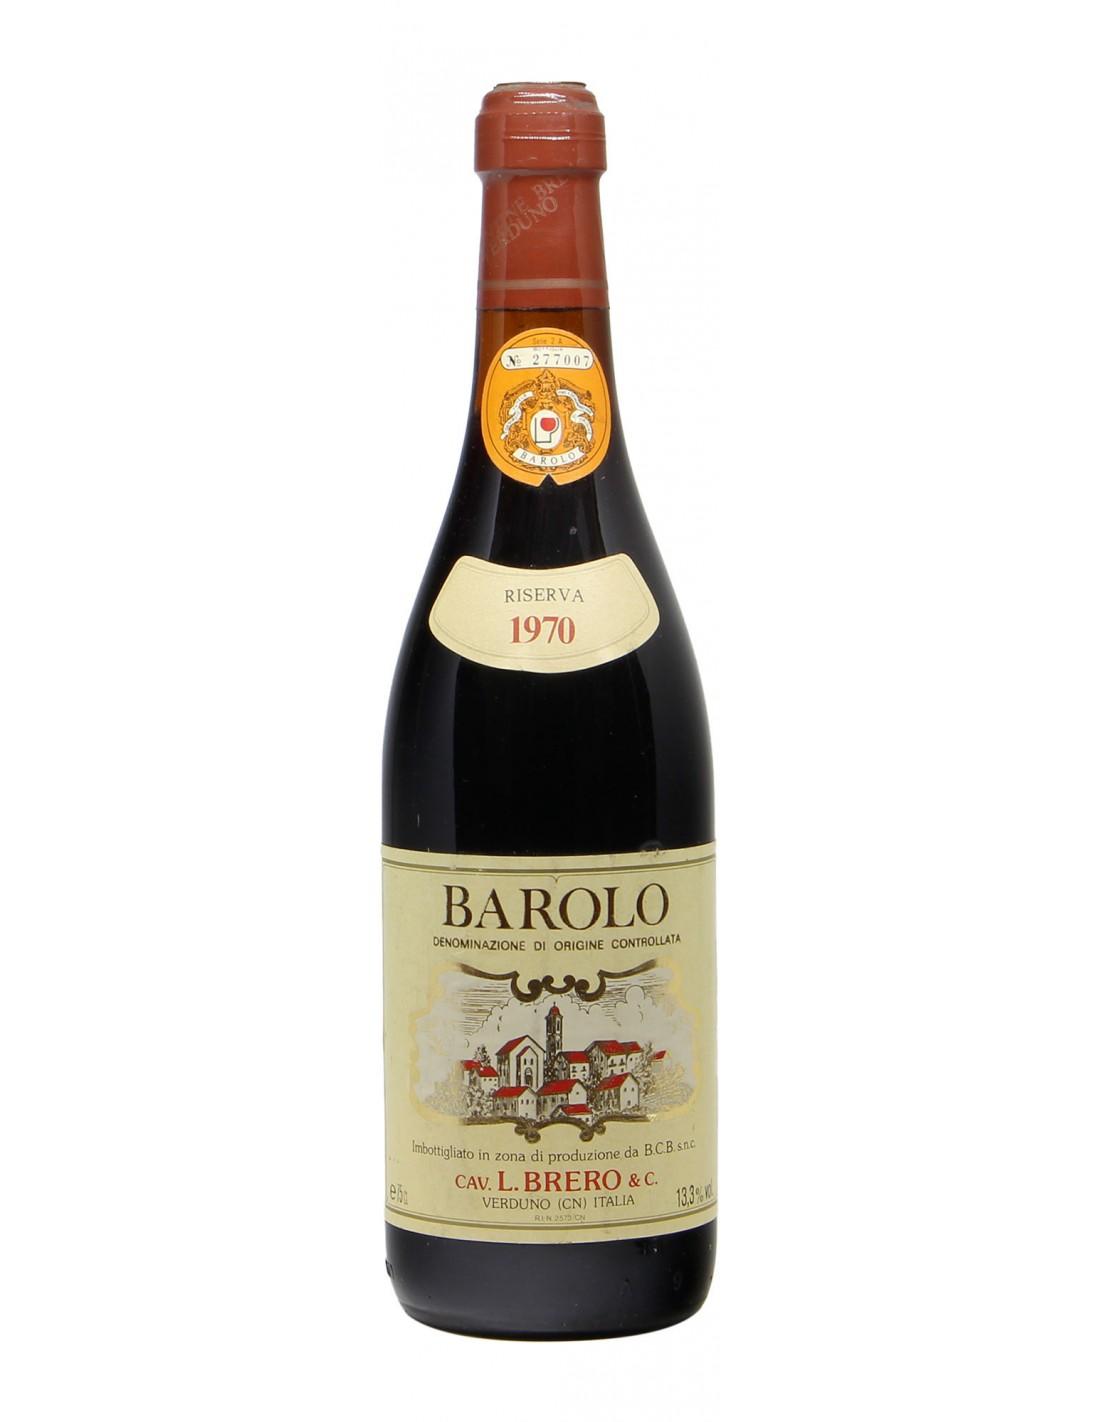 Barolo 1970 BRERO GRANDI BOTTIGLIE